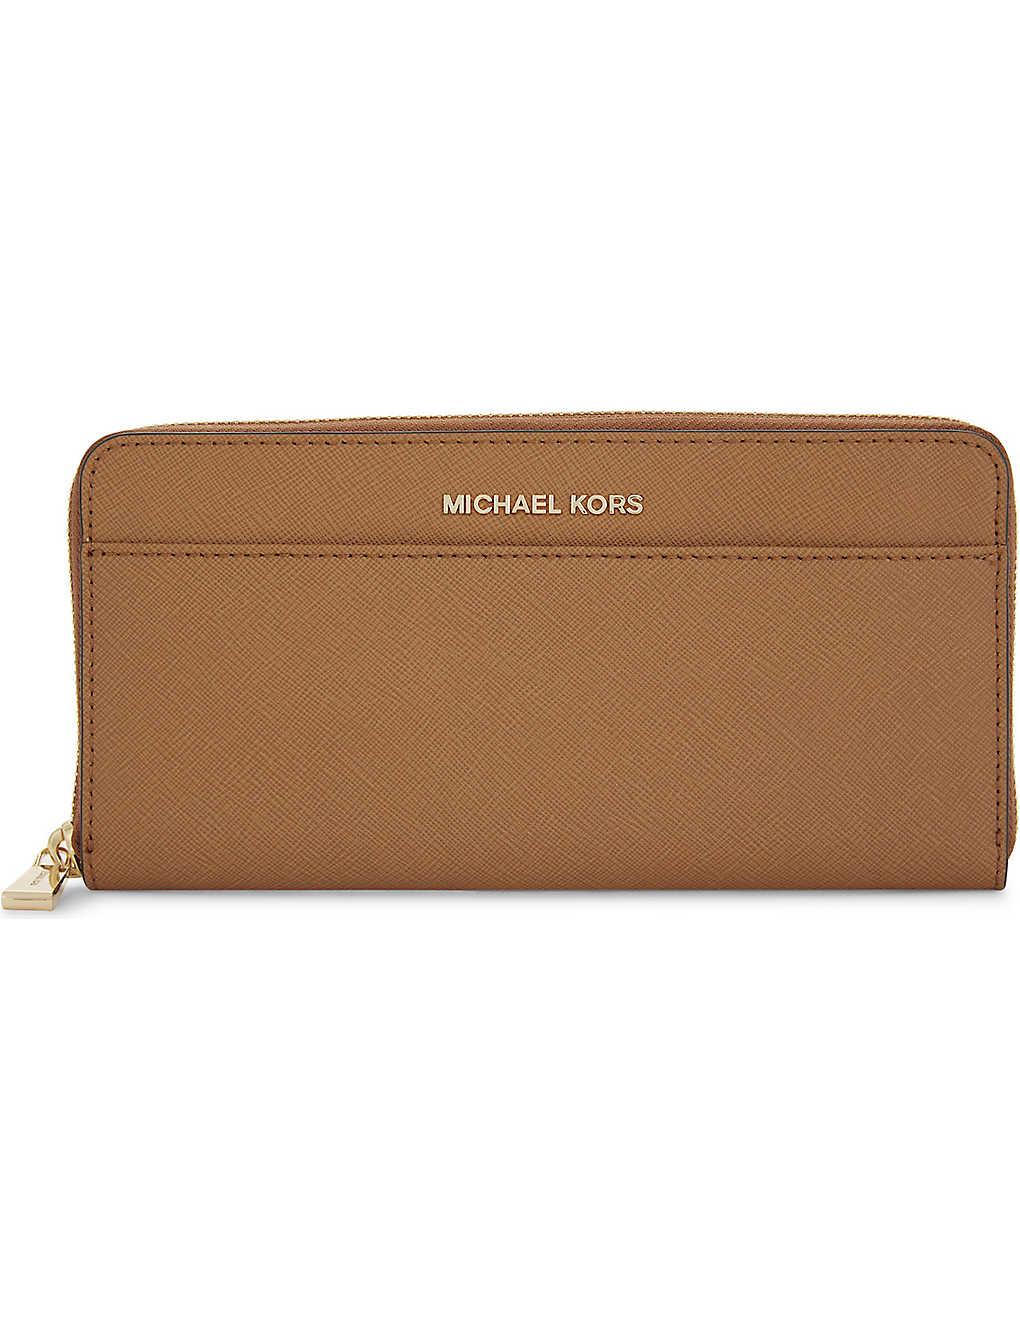 7ae189937736 MICHAEL MICHAEL KORS - Jet Set leather continental wallet ...